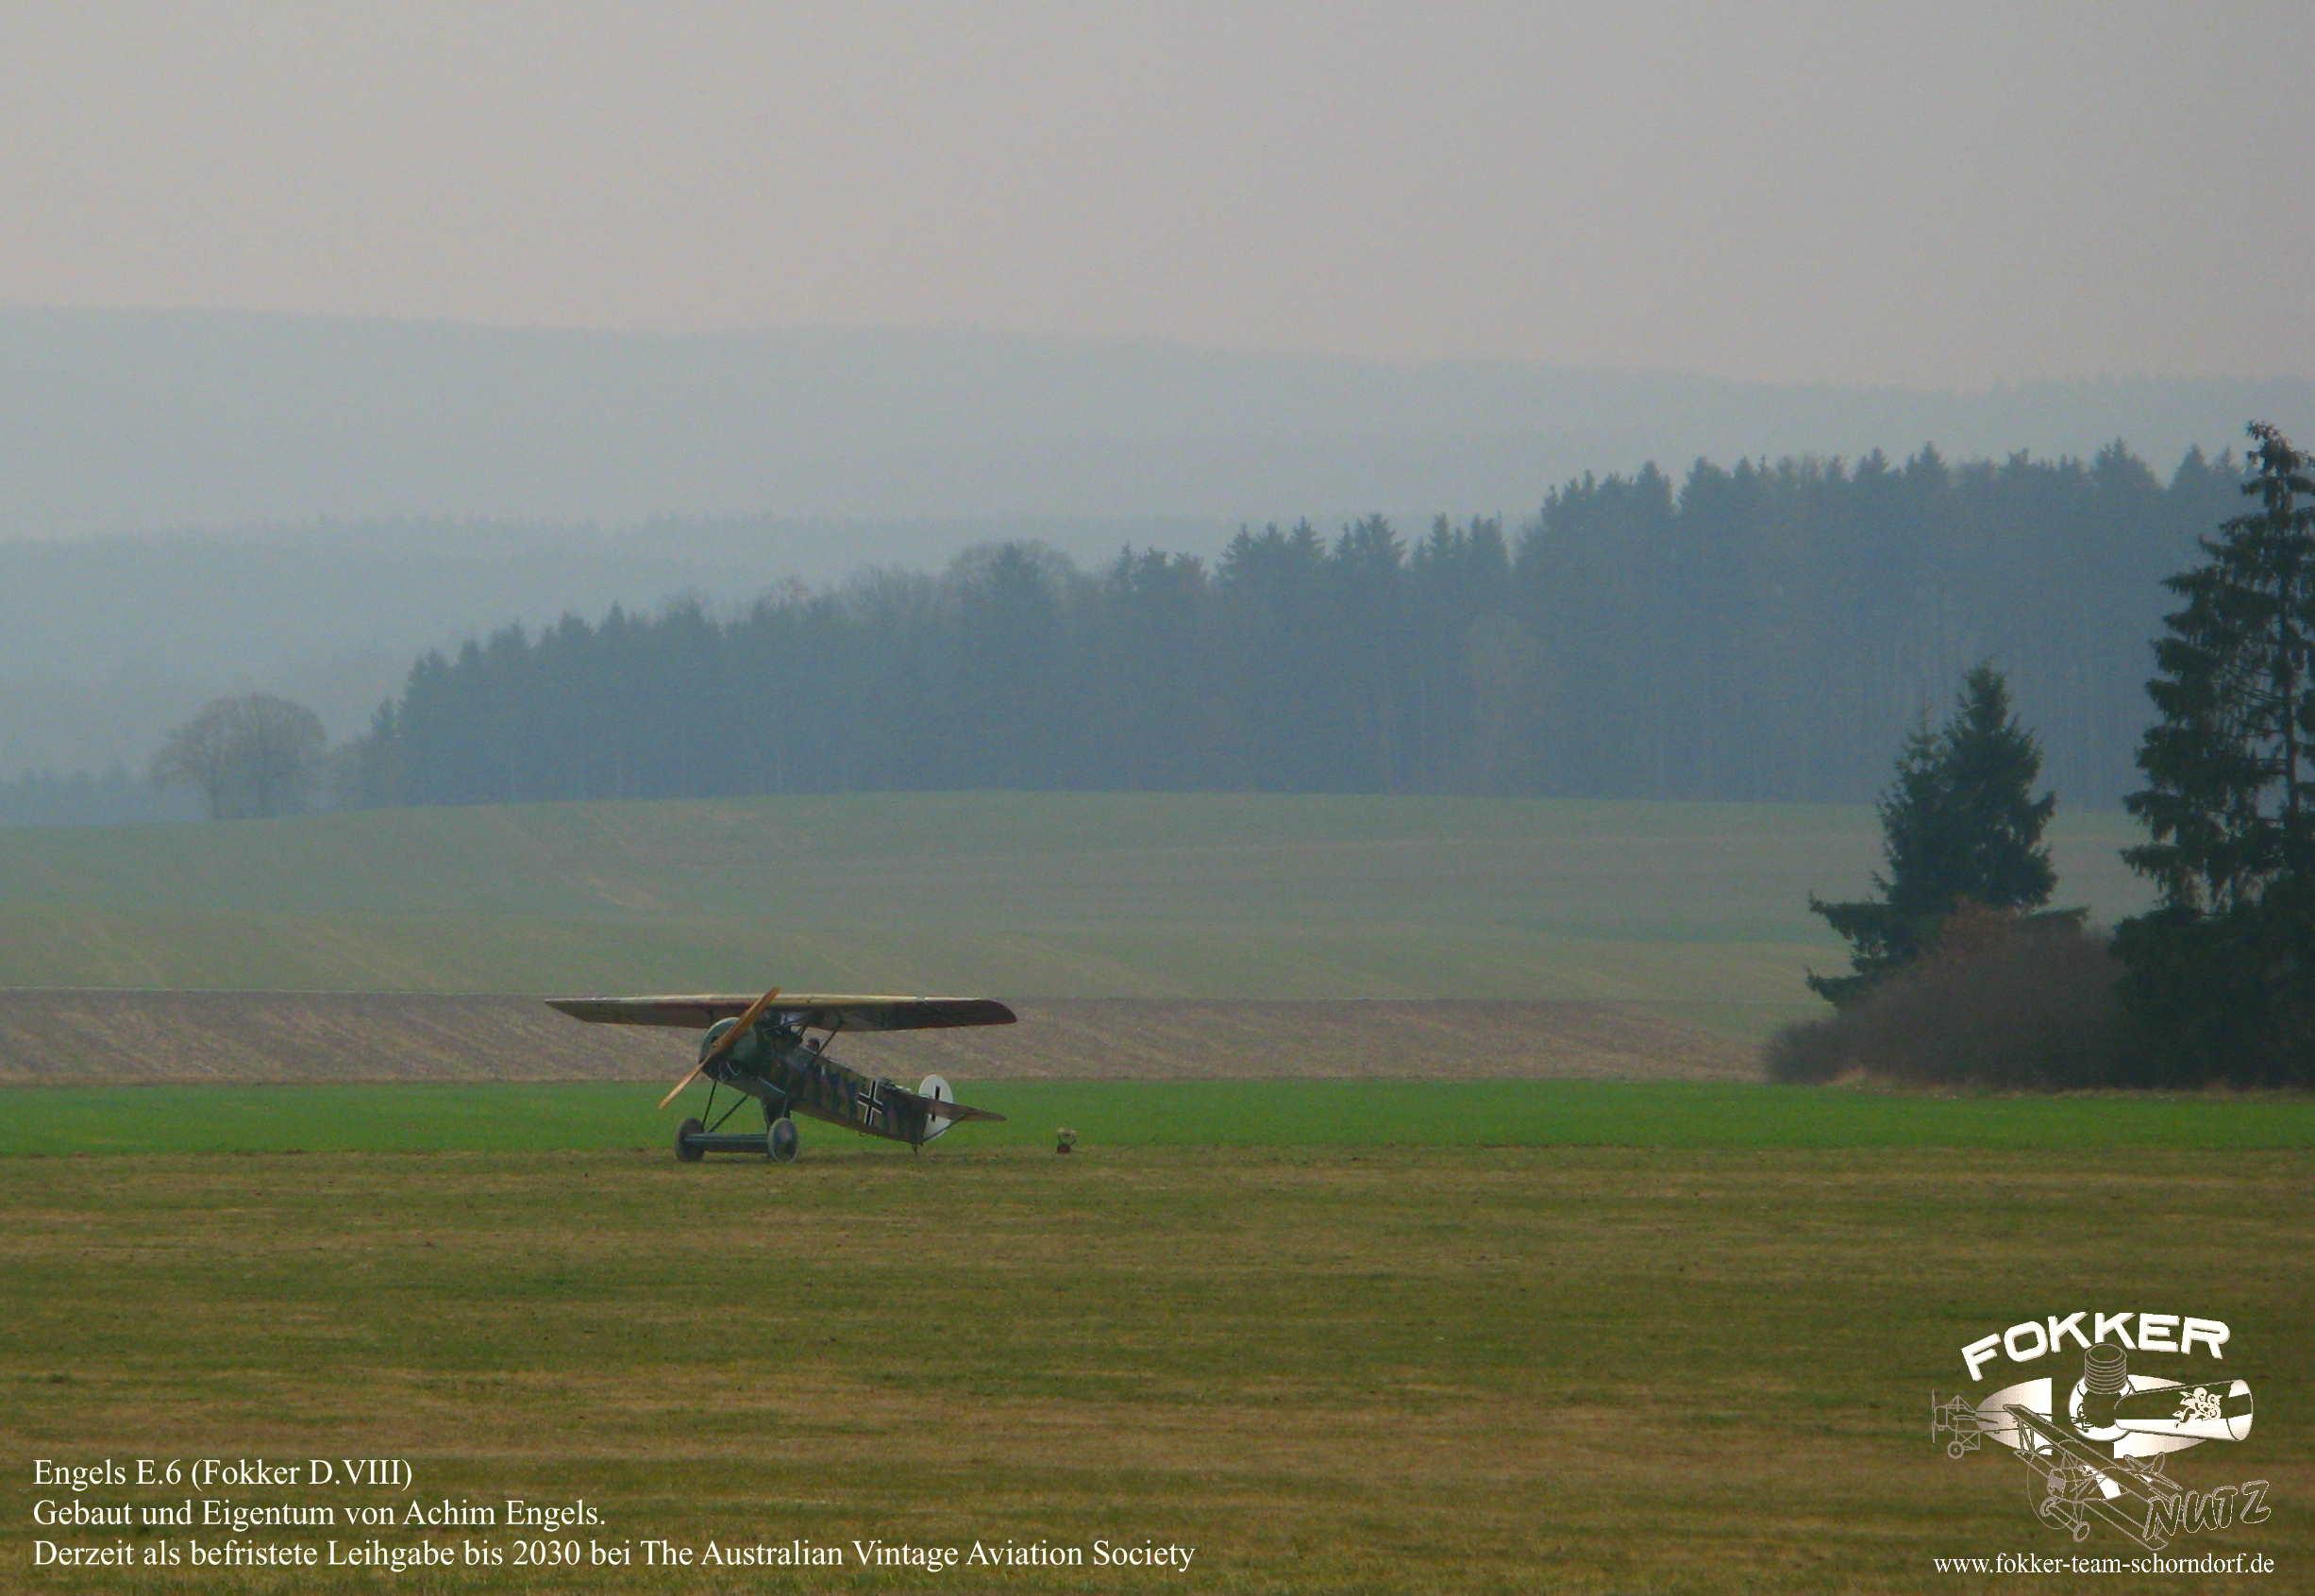 Engels E.6 (Fokker D.8) - Nachbau kurz nach der fertigstellung